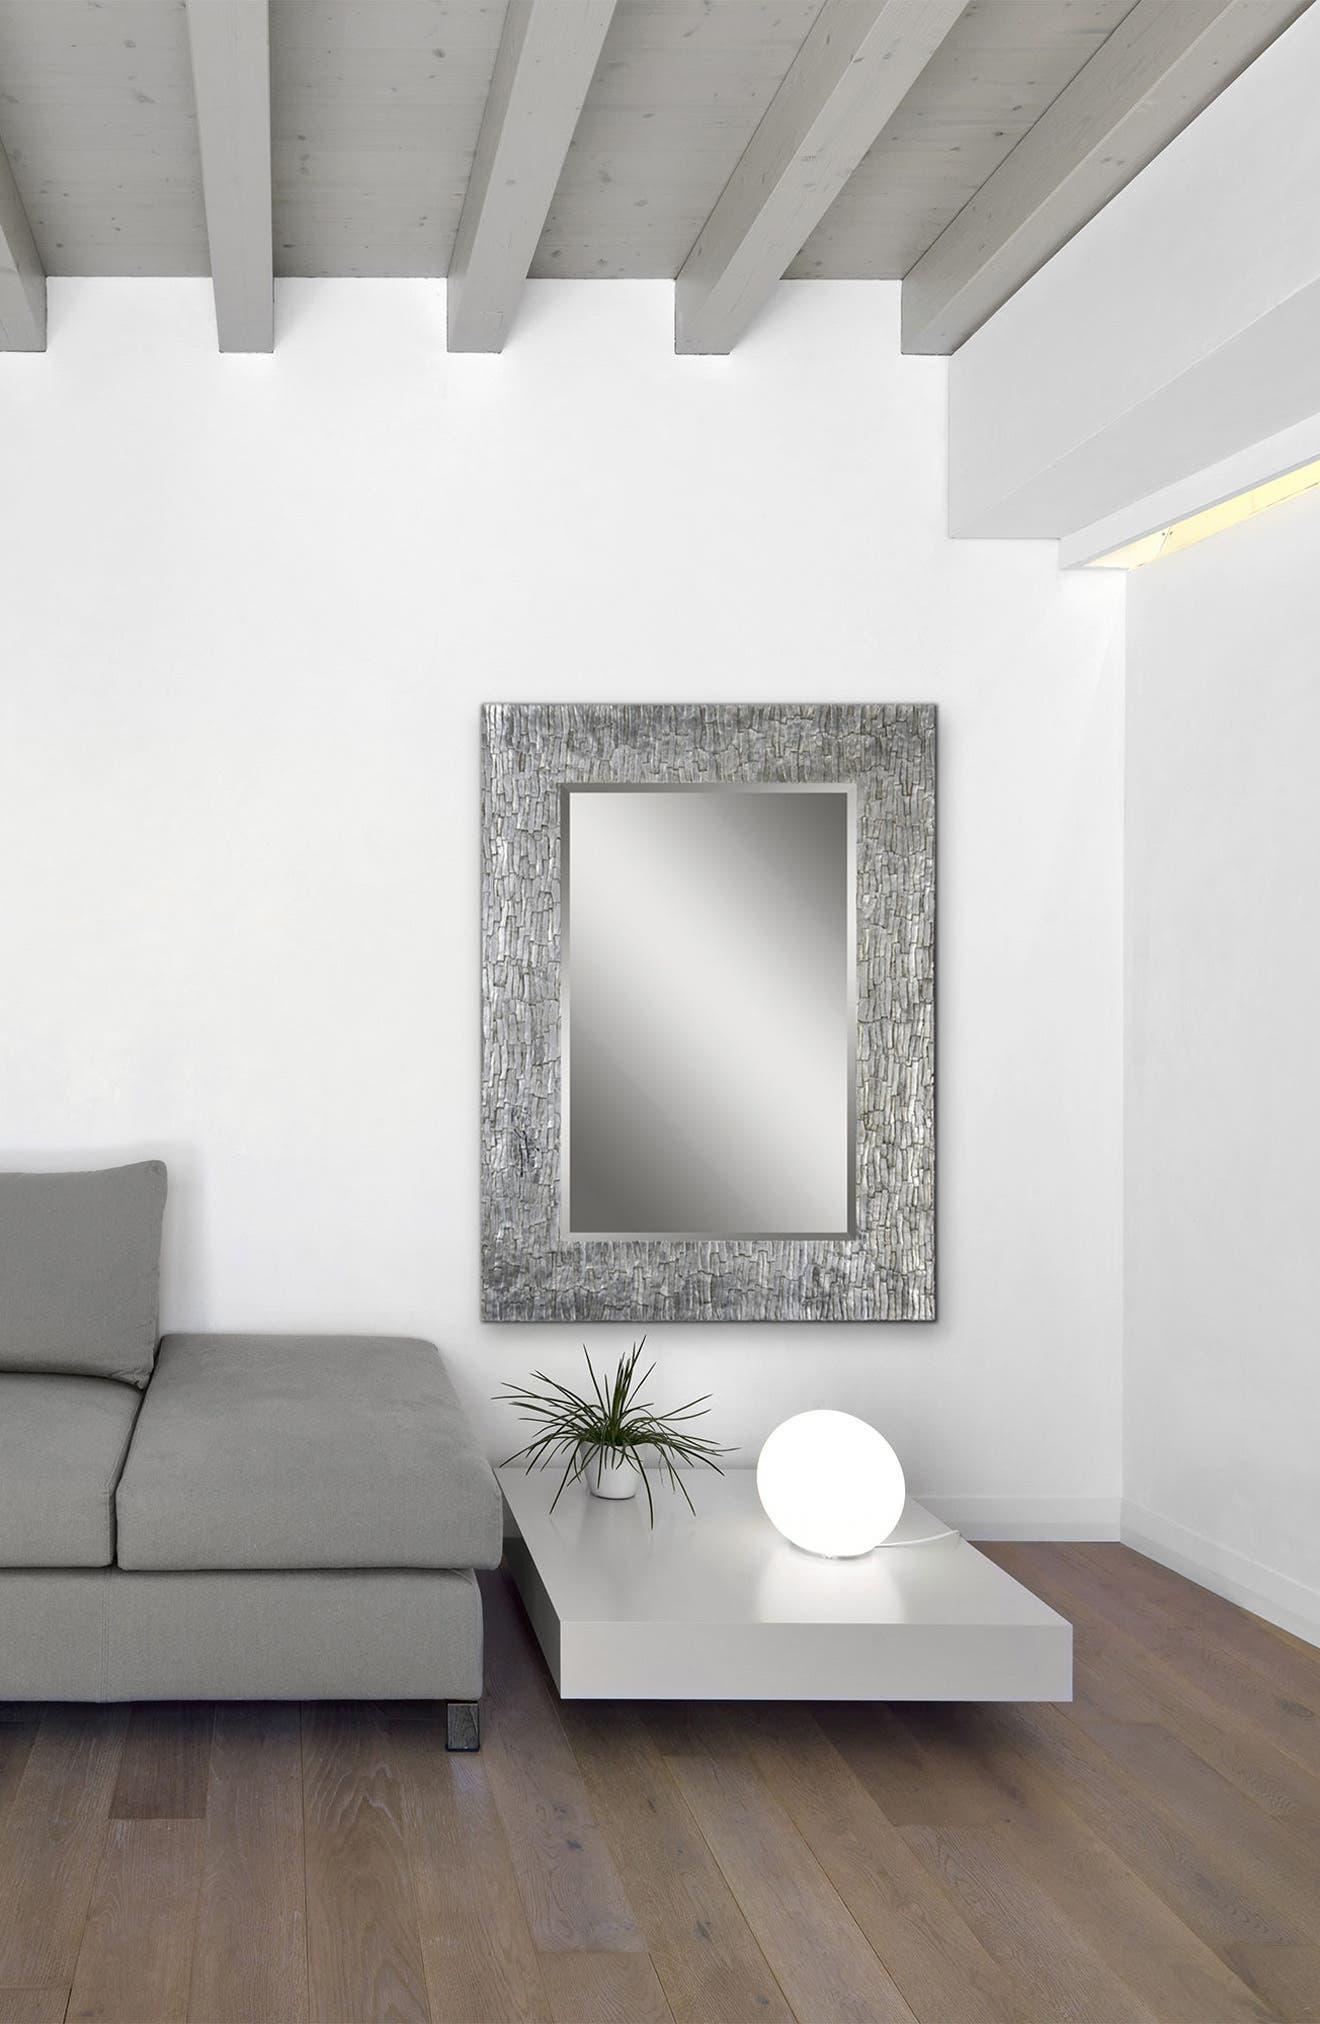 Santa Fe Mirror,                             Alternate thumbnail 2, color,                             Silver Leaf/ Bark Texture